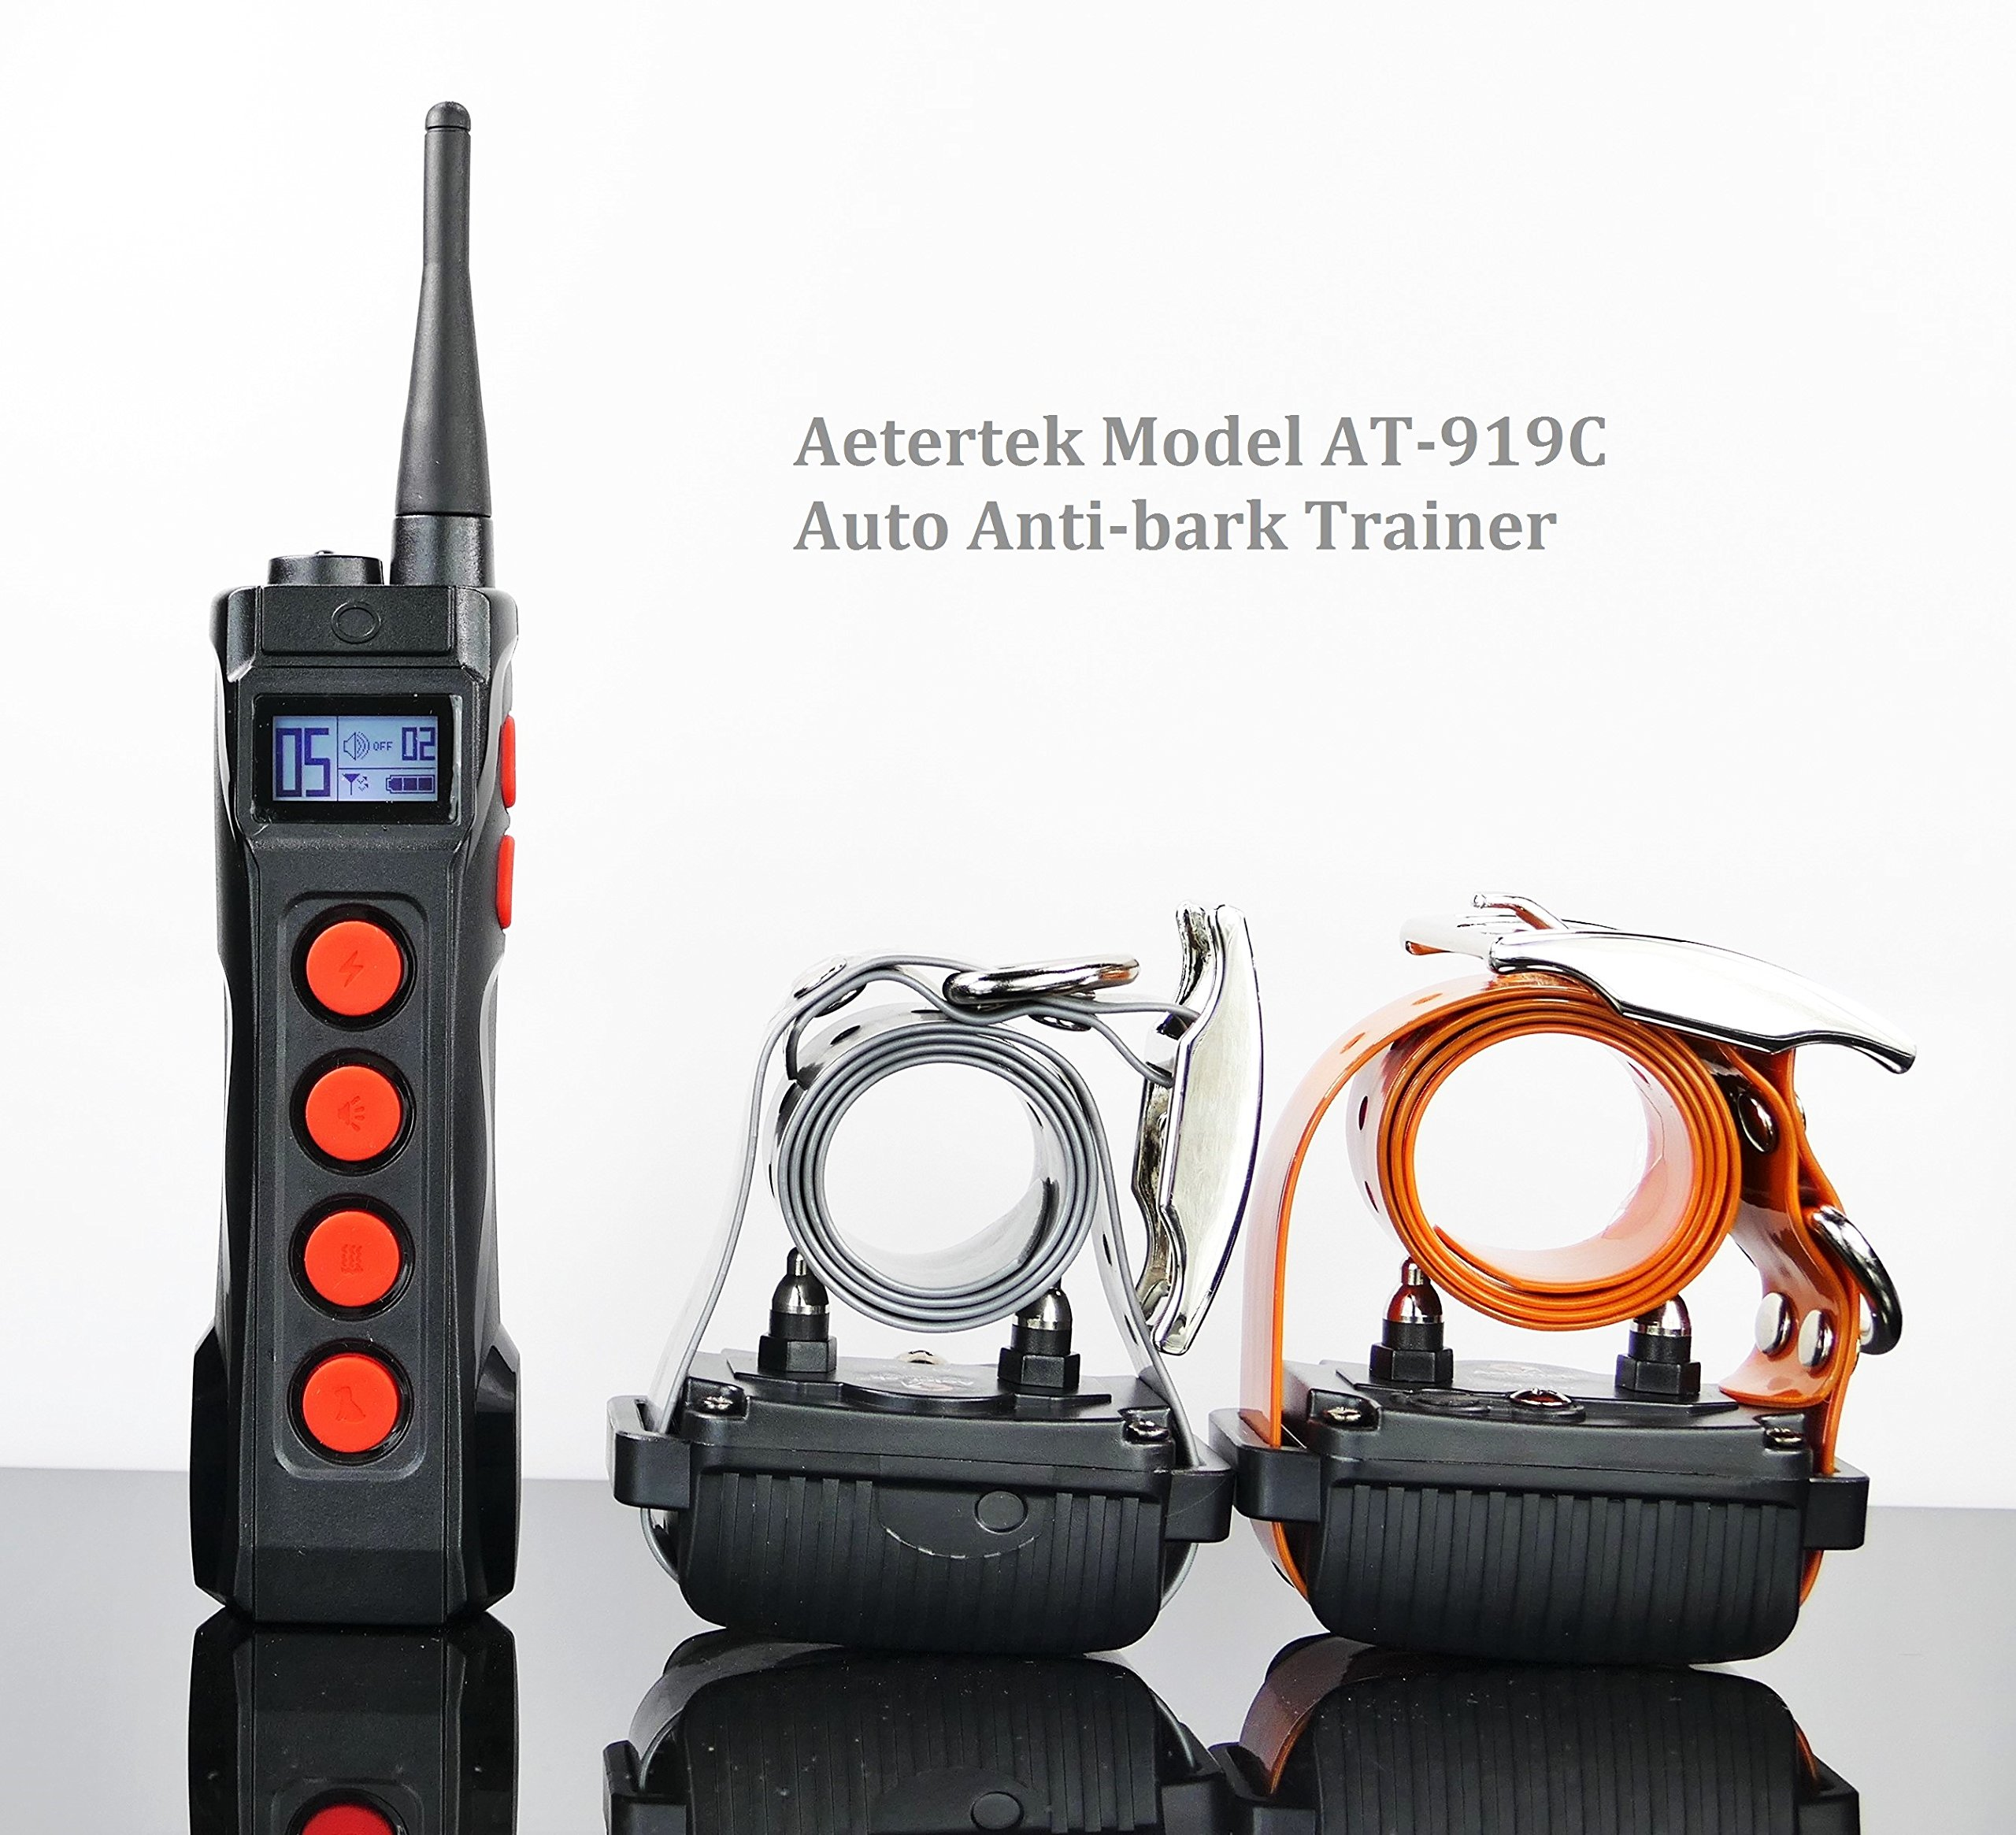 Aetertek 1000 Meter Remote Dog Training Trainer Rechargeable Waterproof Collar w/Safe and Humane Tone,Vibration,10 Levels of Adjustable Static Stimulation,Auto Anti Bark (Two Dog Set) by Aetertek